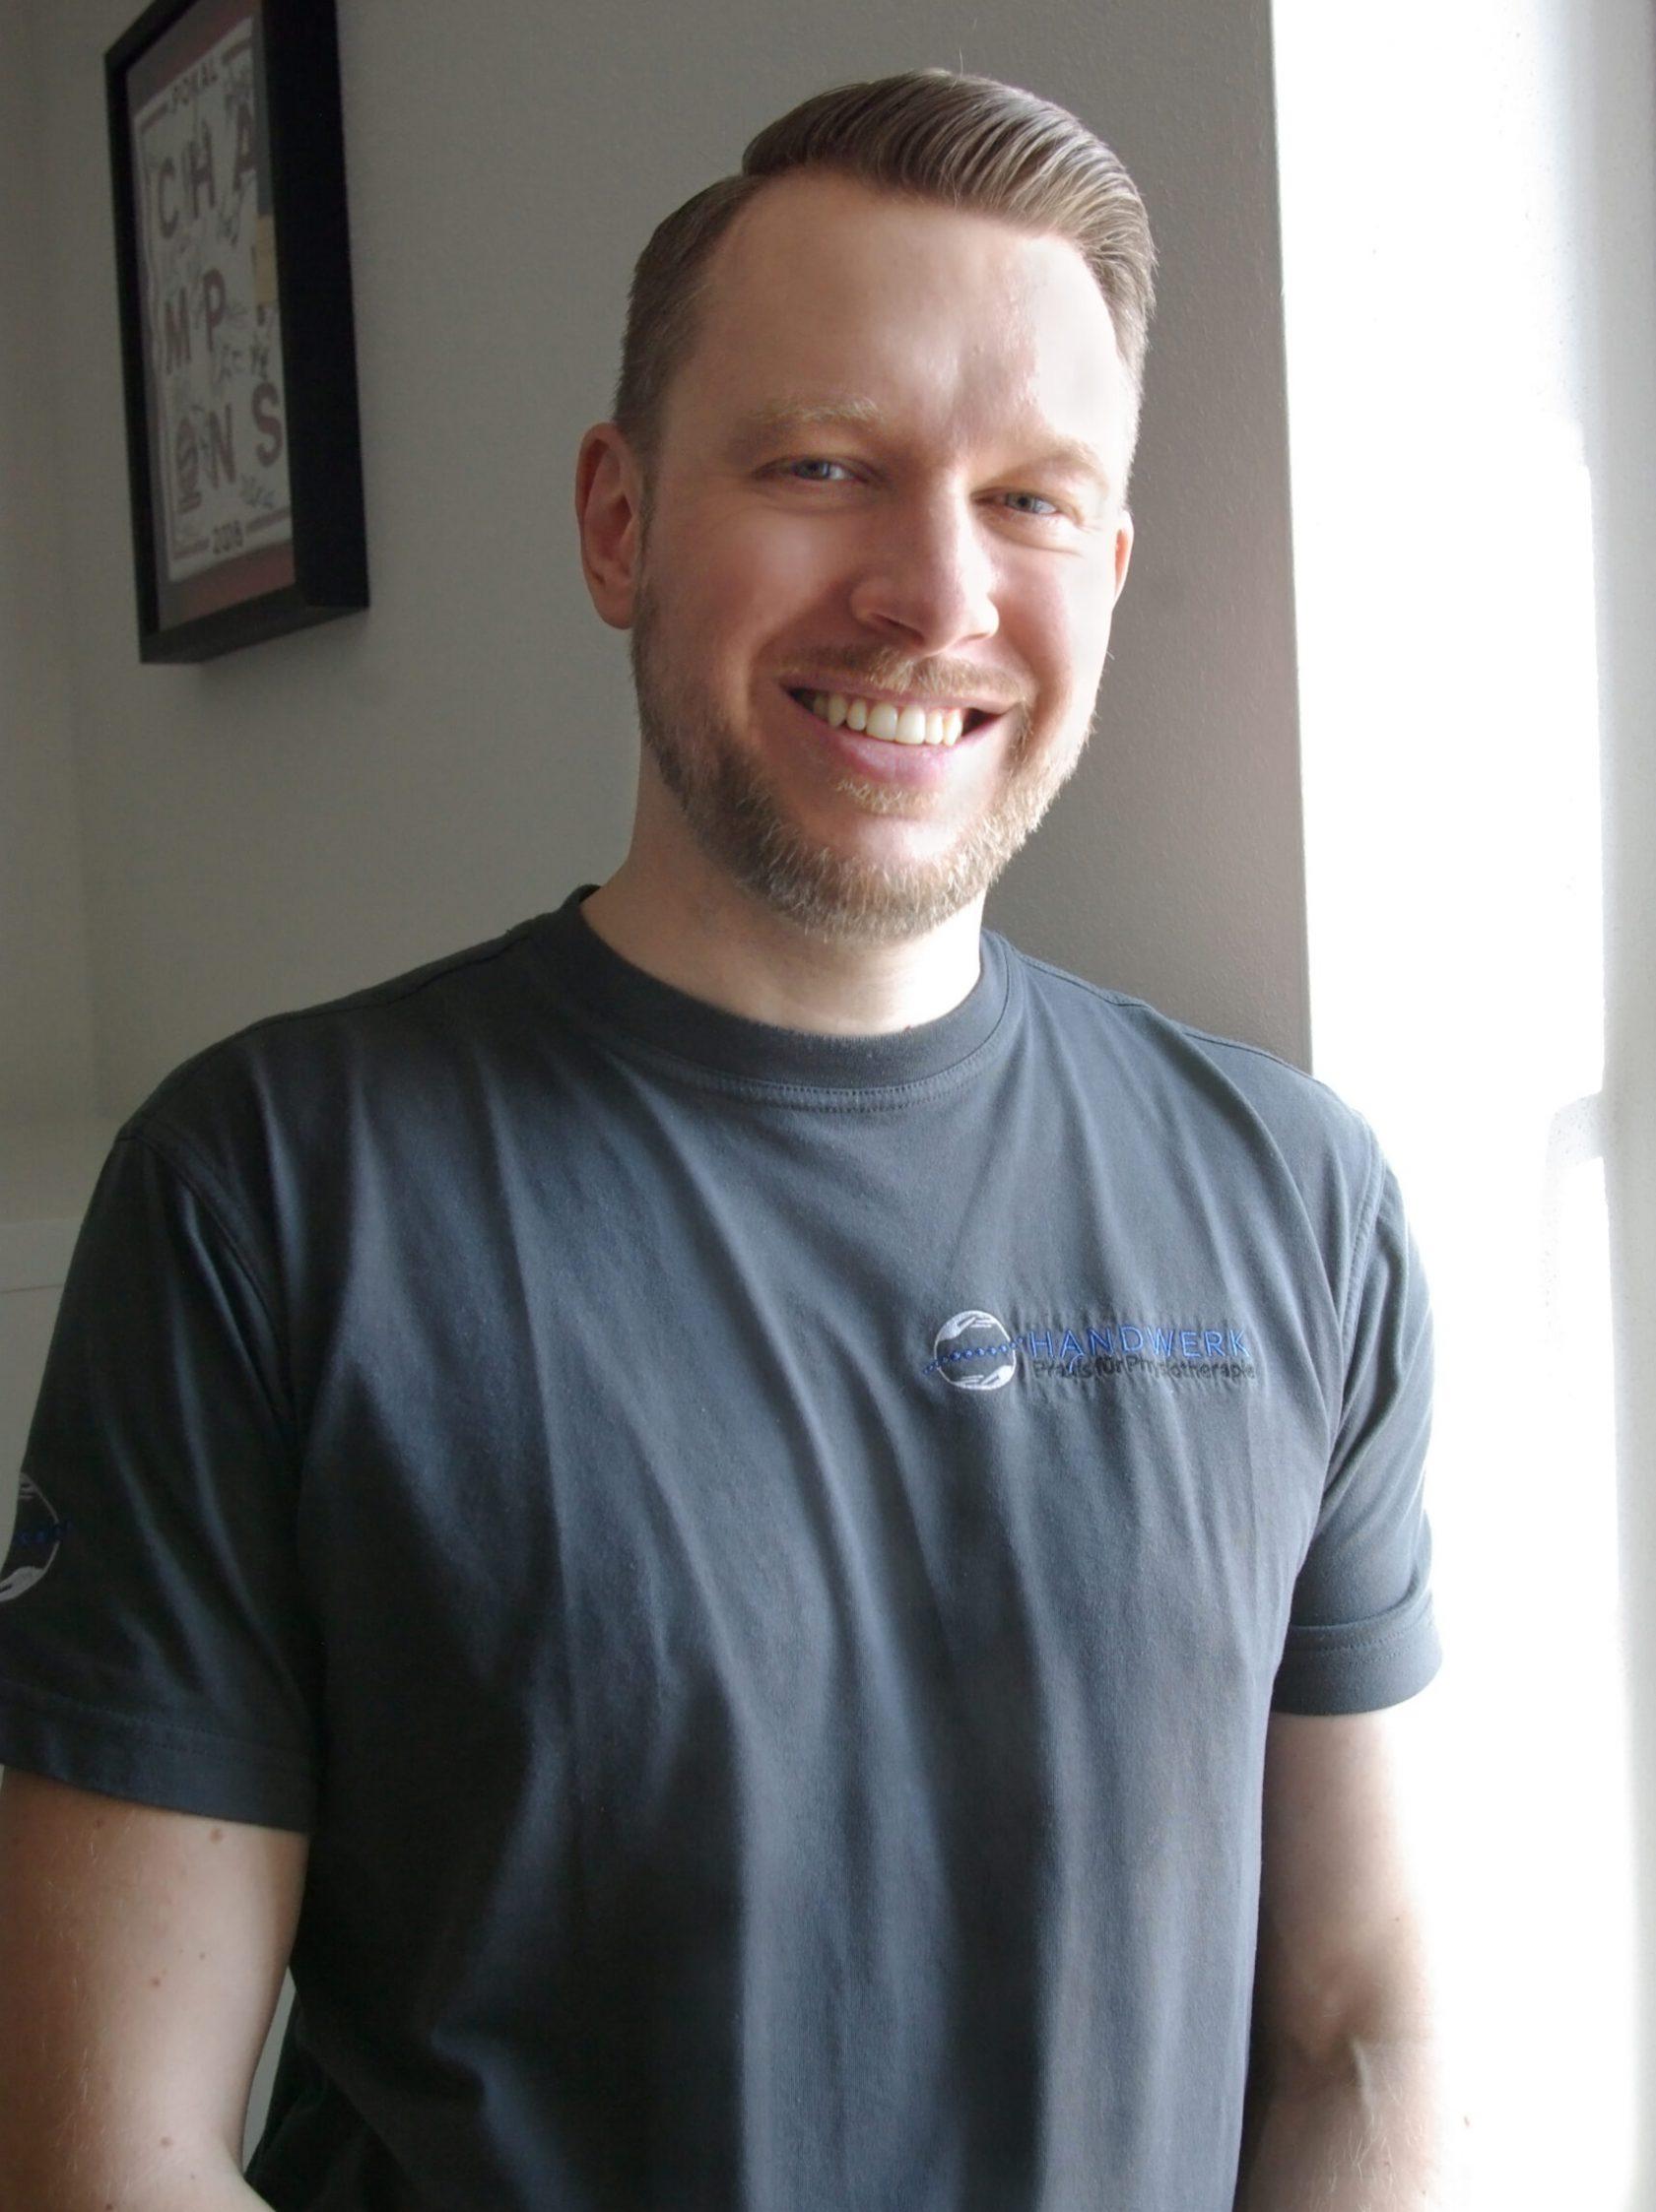 Michael Otte